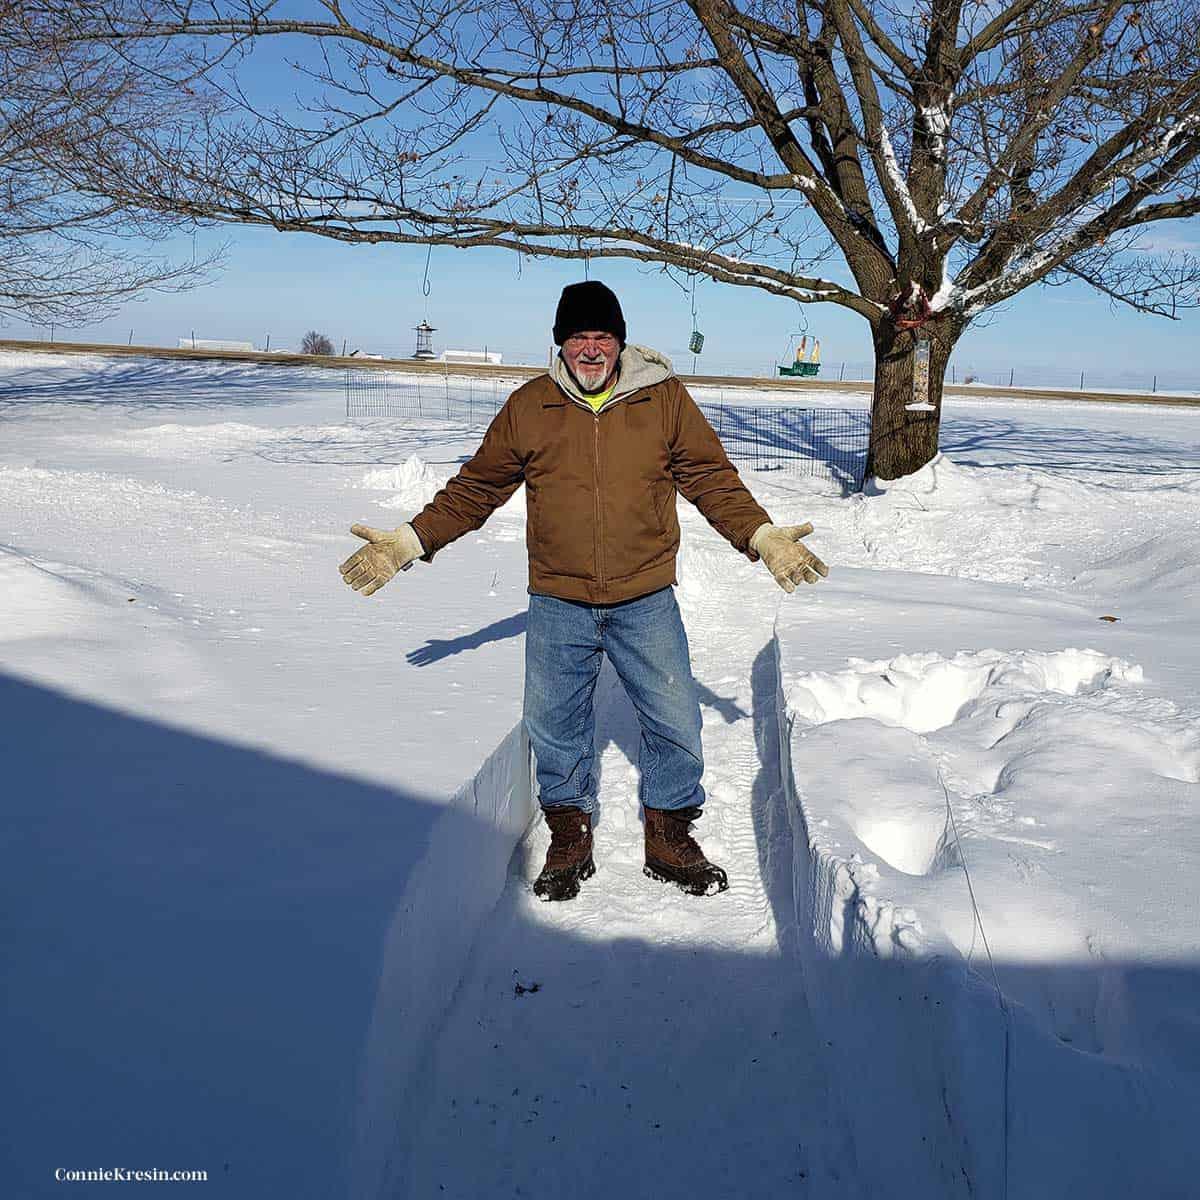 Builder Bob in the snow